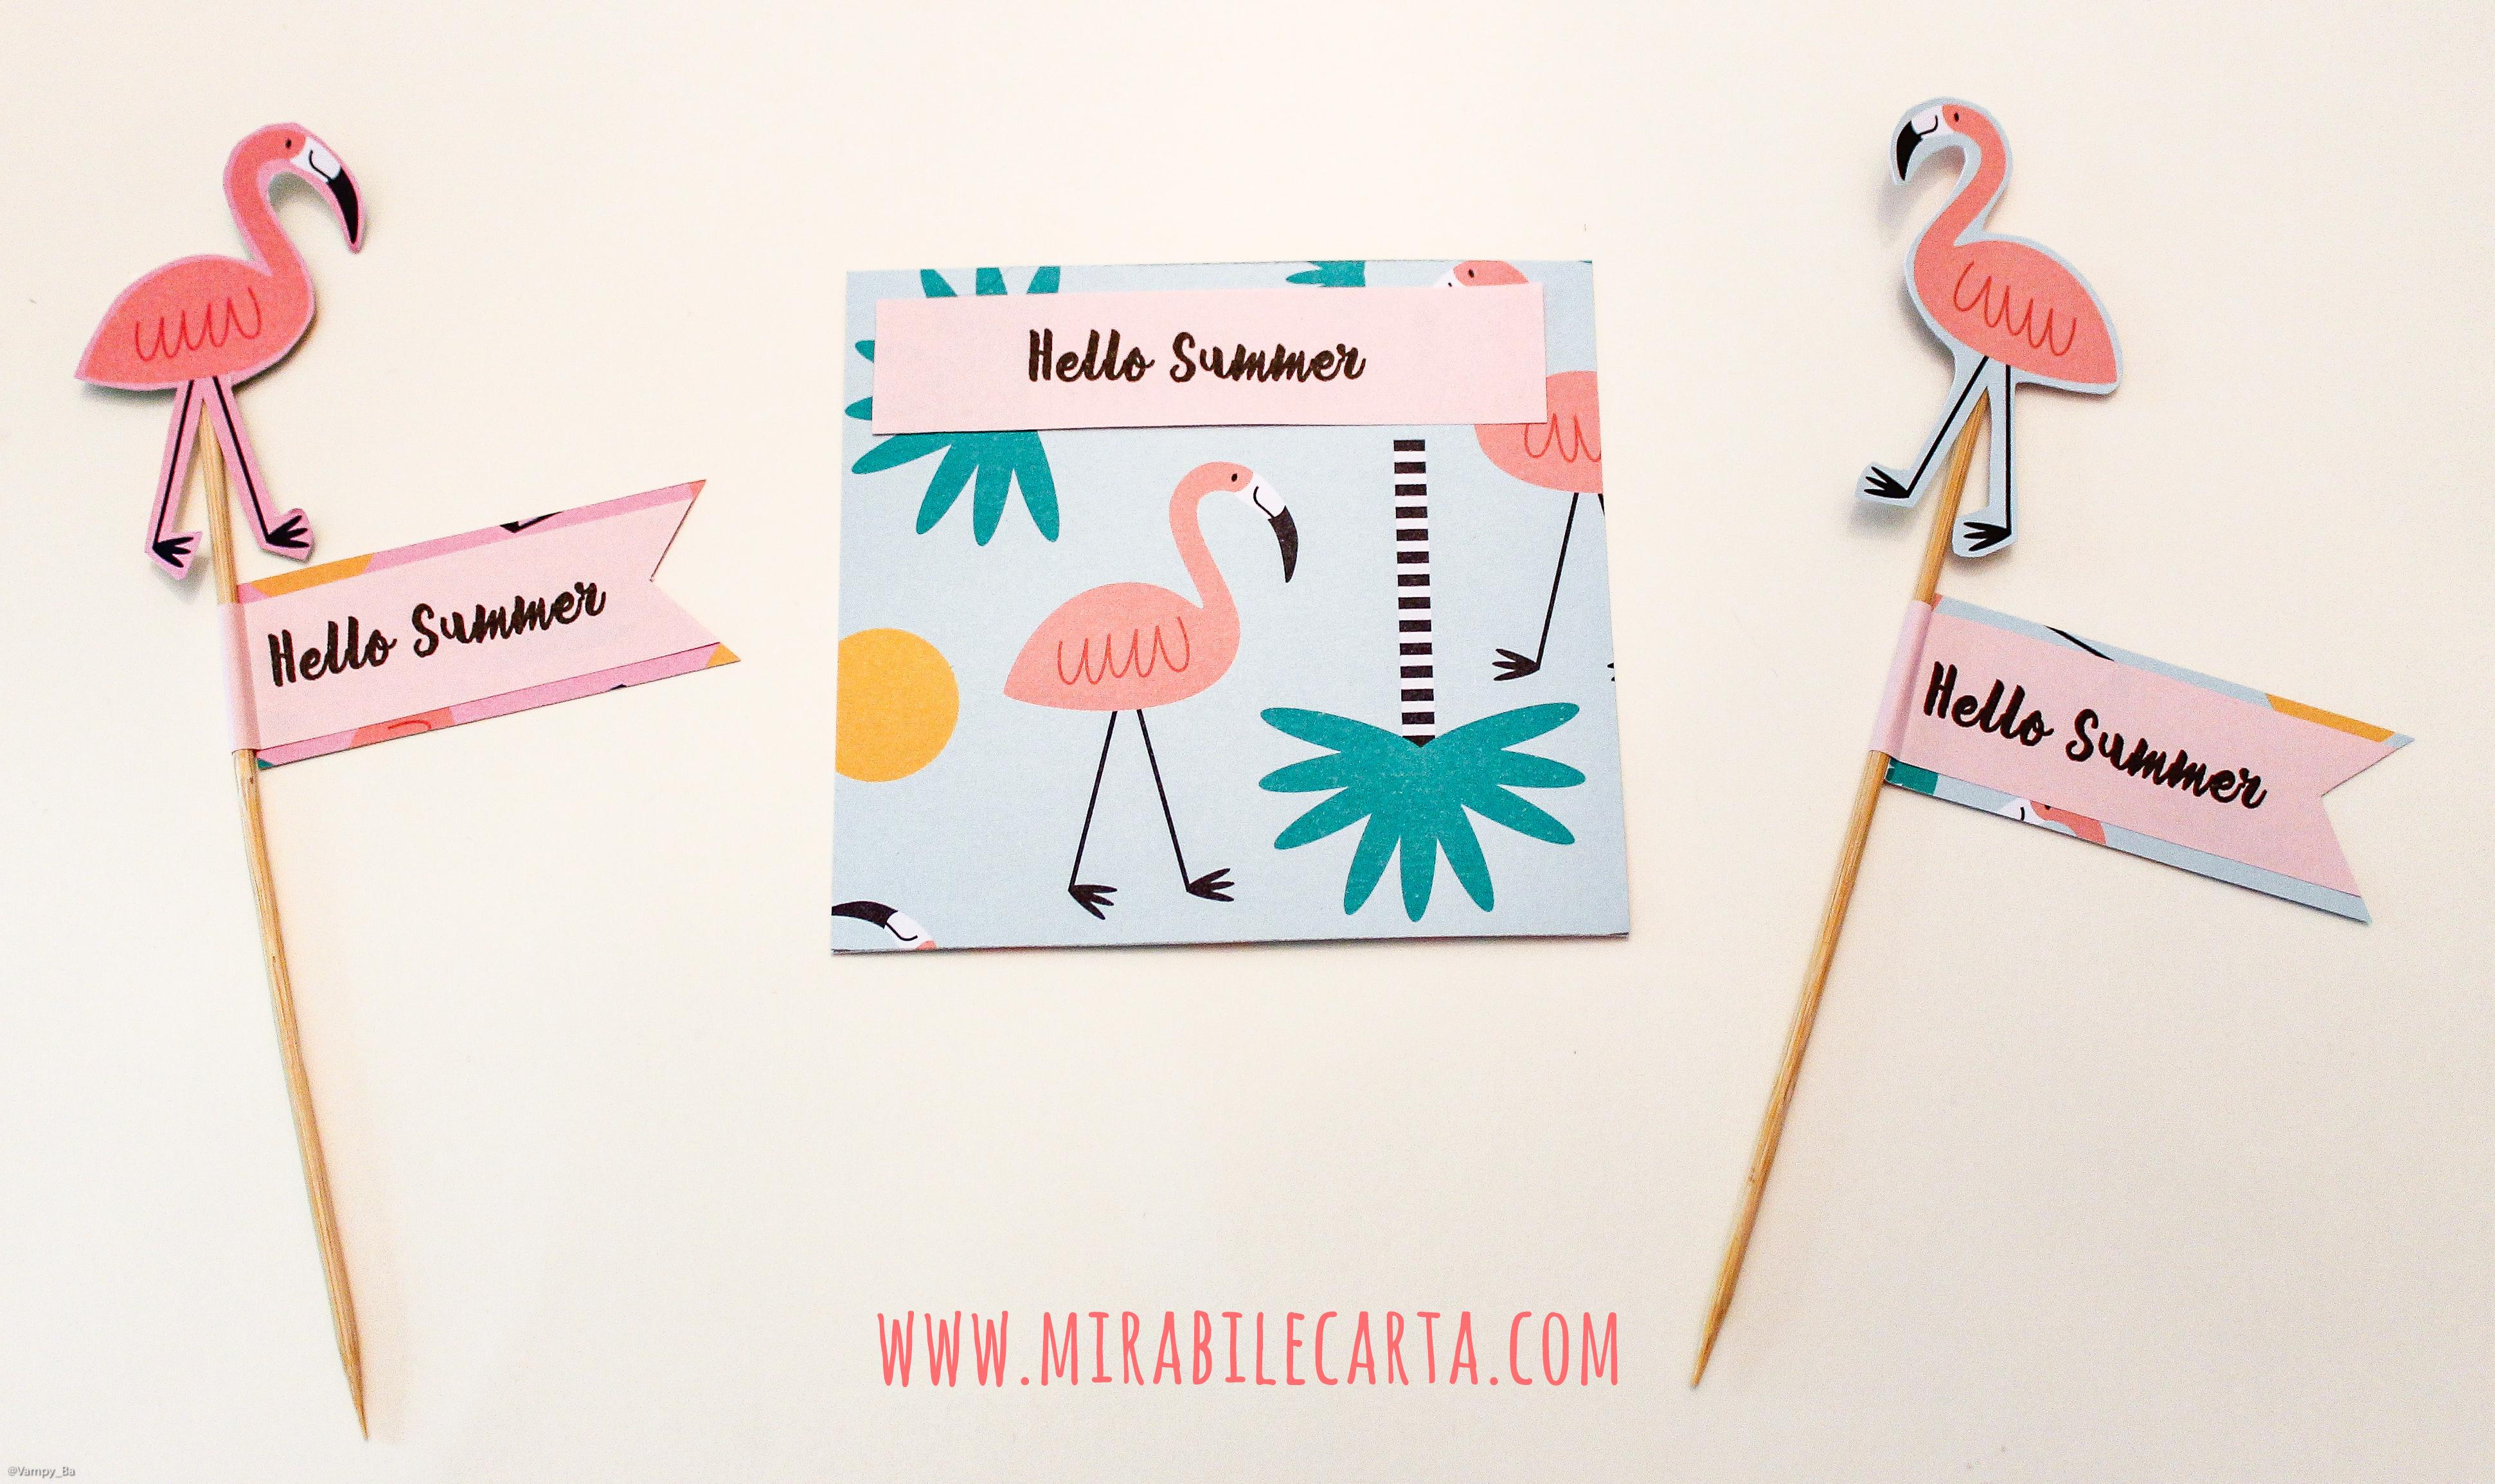 FlamingoMilkBox_mirabilecarta03.jpg